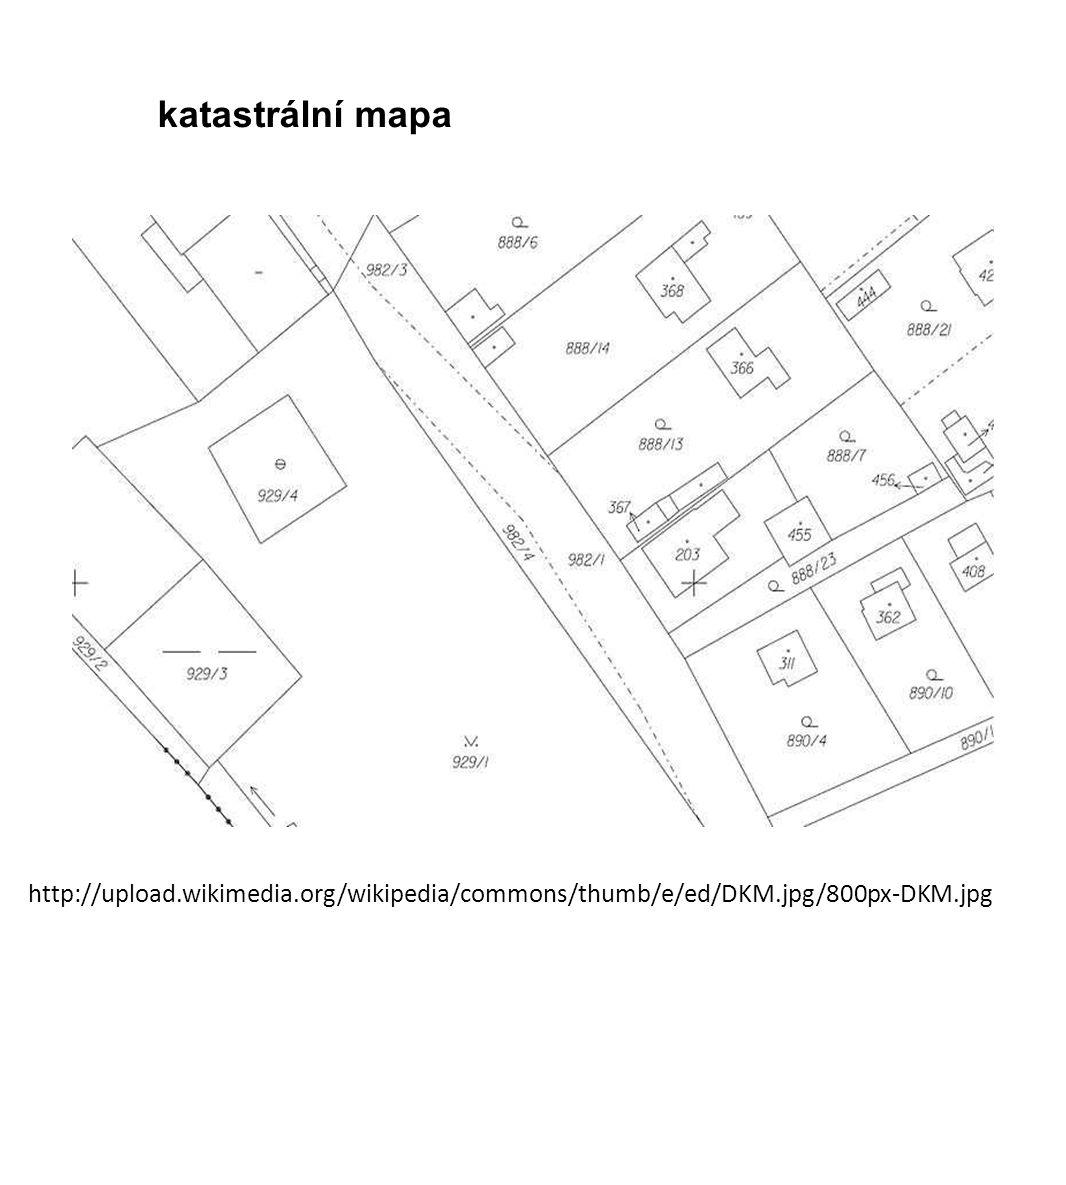 http://upload.wikimedia.org/wikipedia/commons/thumb/e/ed/DKM.jpg/800px-DKM.jpg katastrální mapa